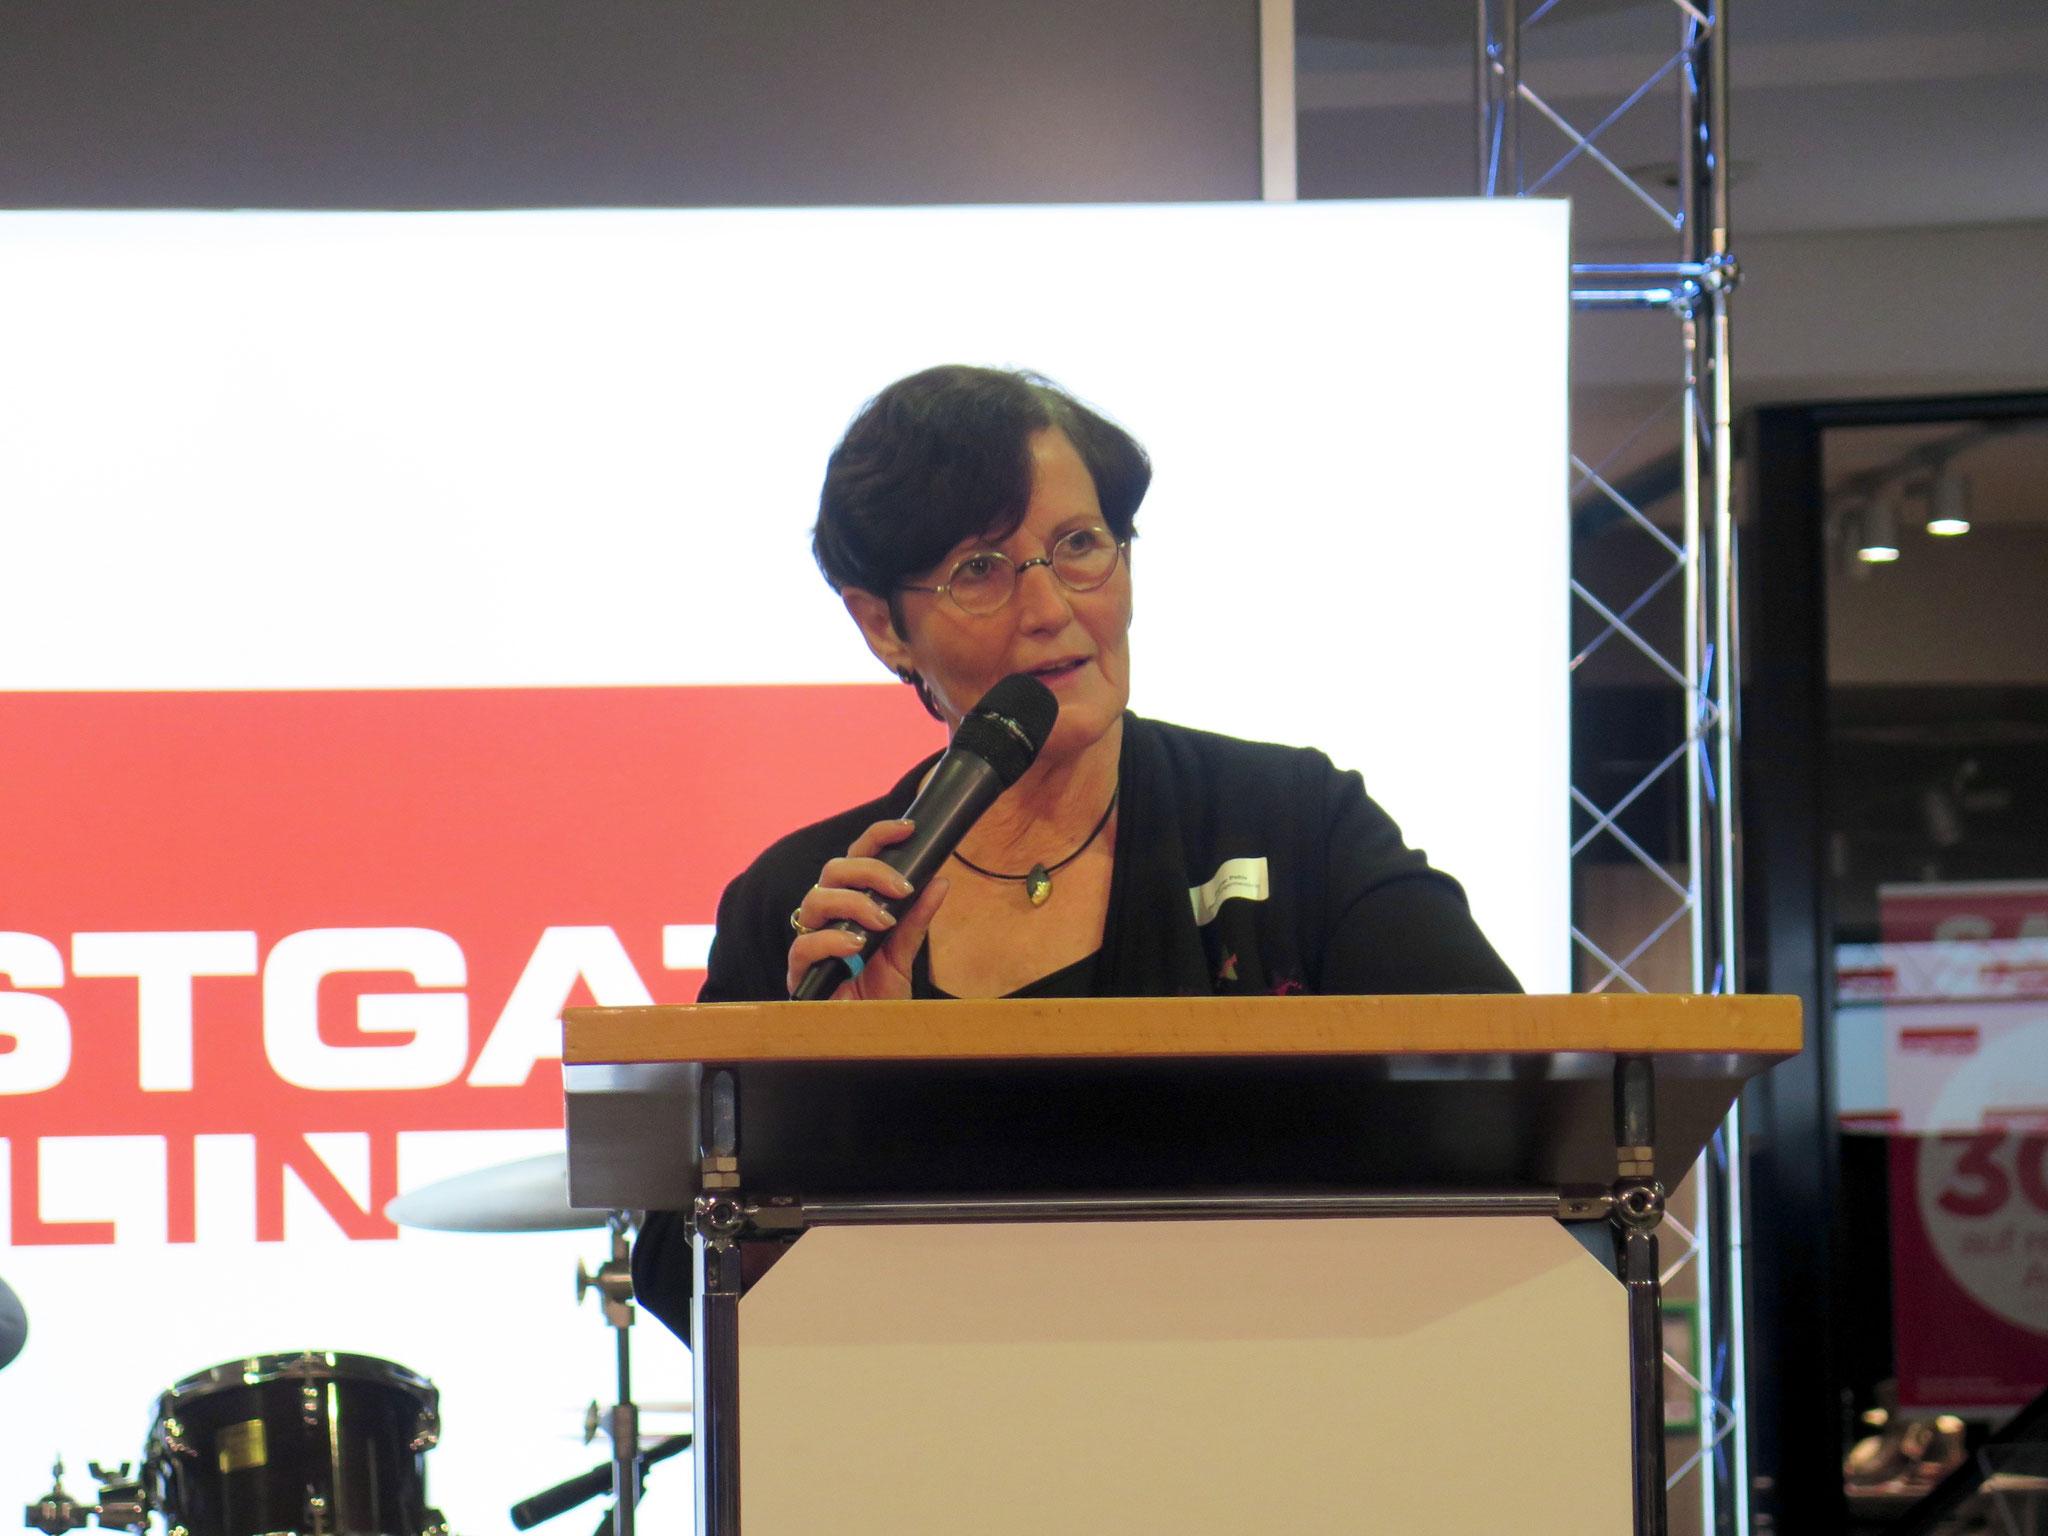 Bezirksbürgermeisterin Dagmar Pohle (Die Linke)